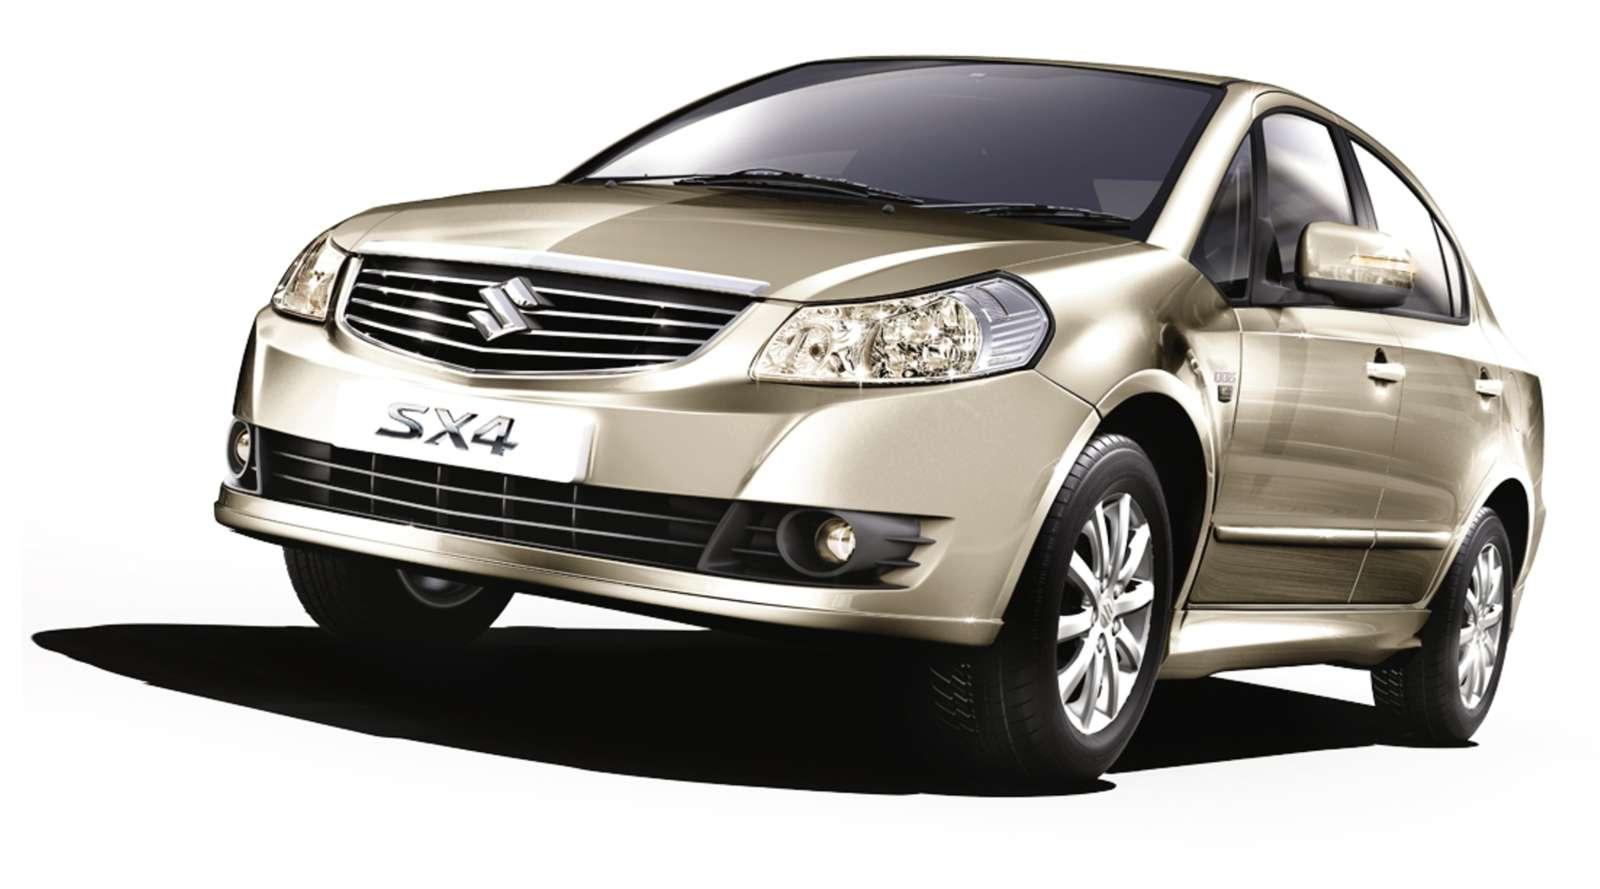 2013 maruti suzuki sx4 facelift 1